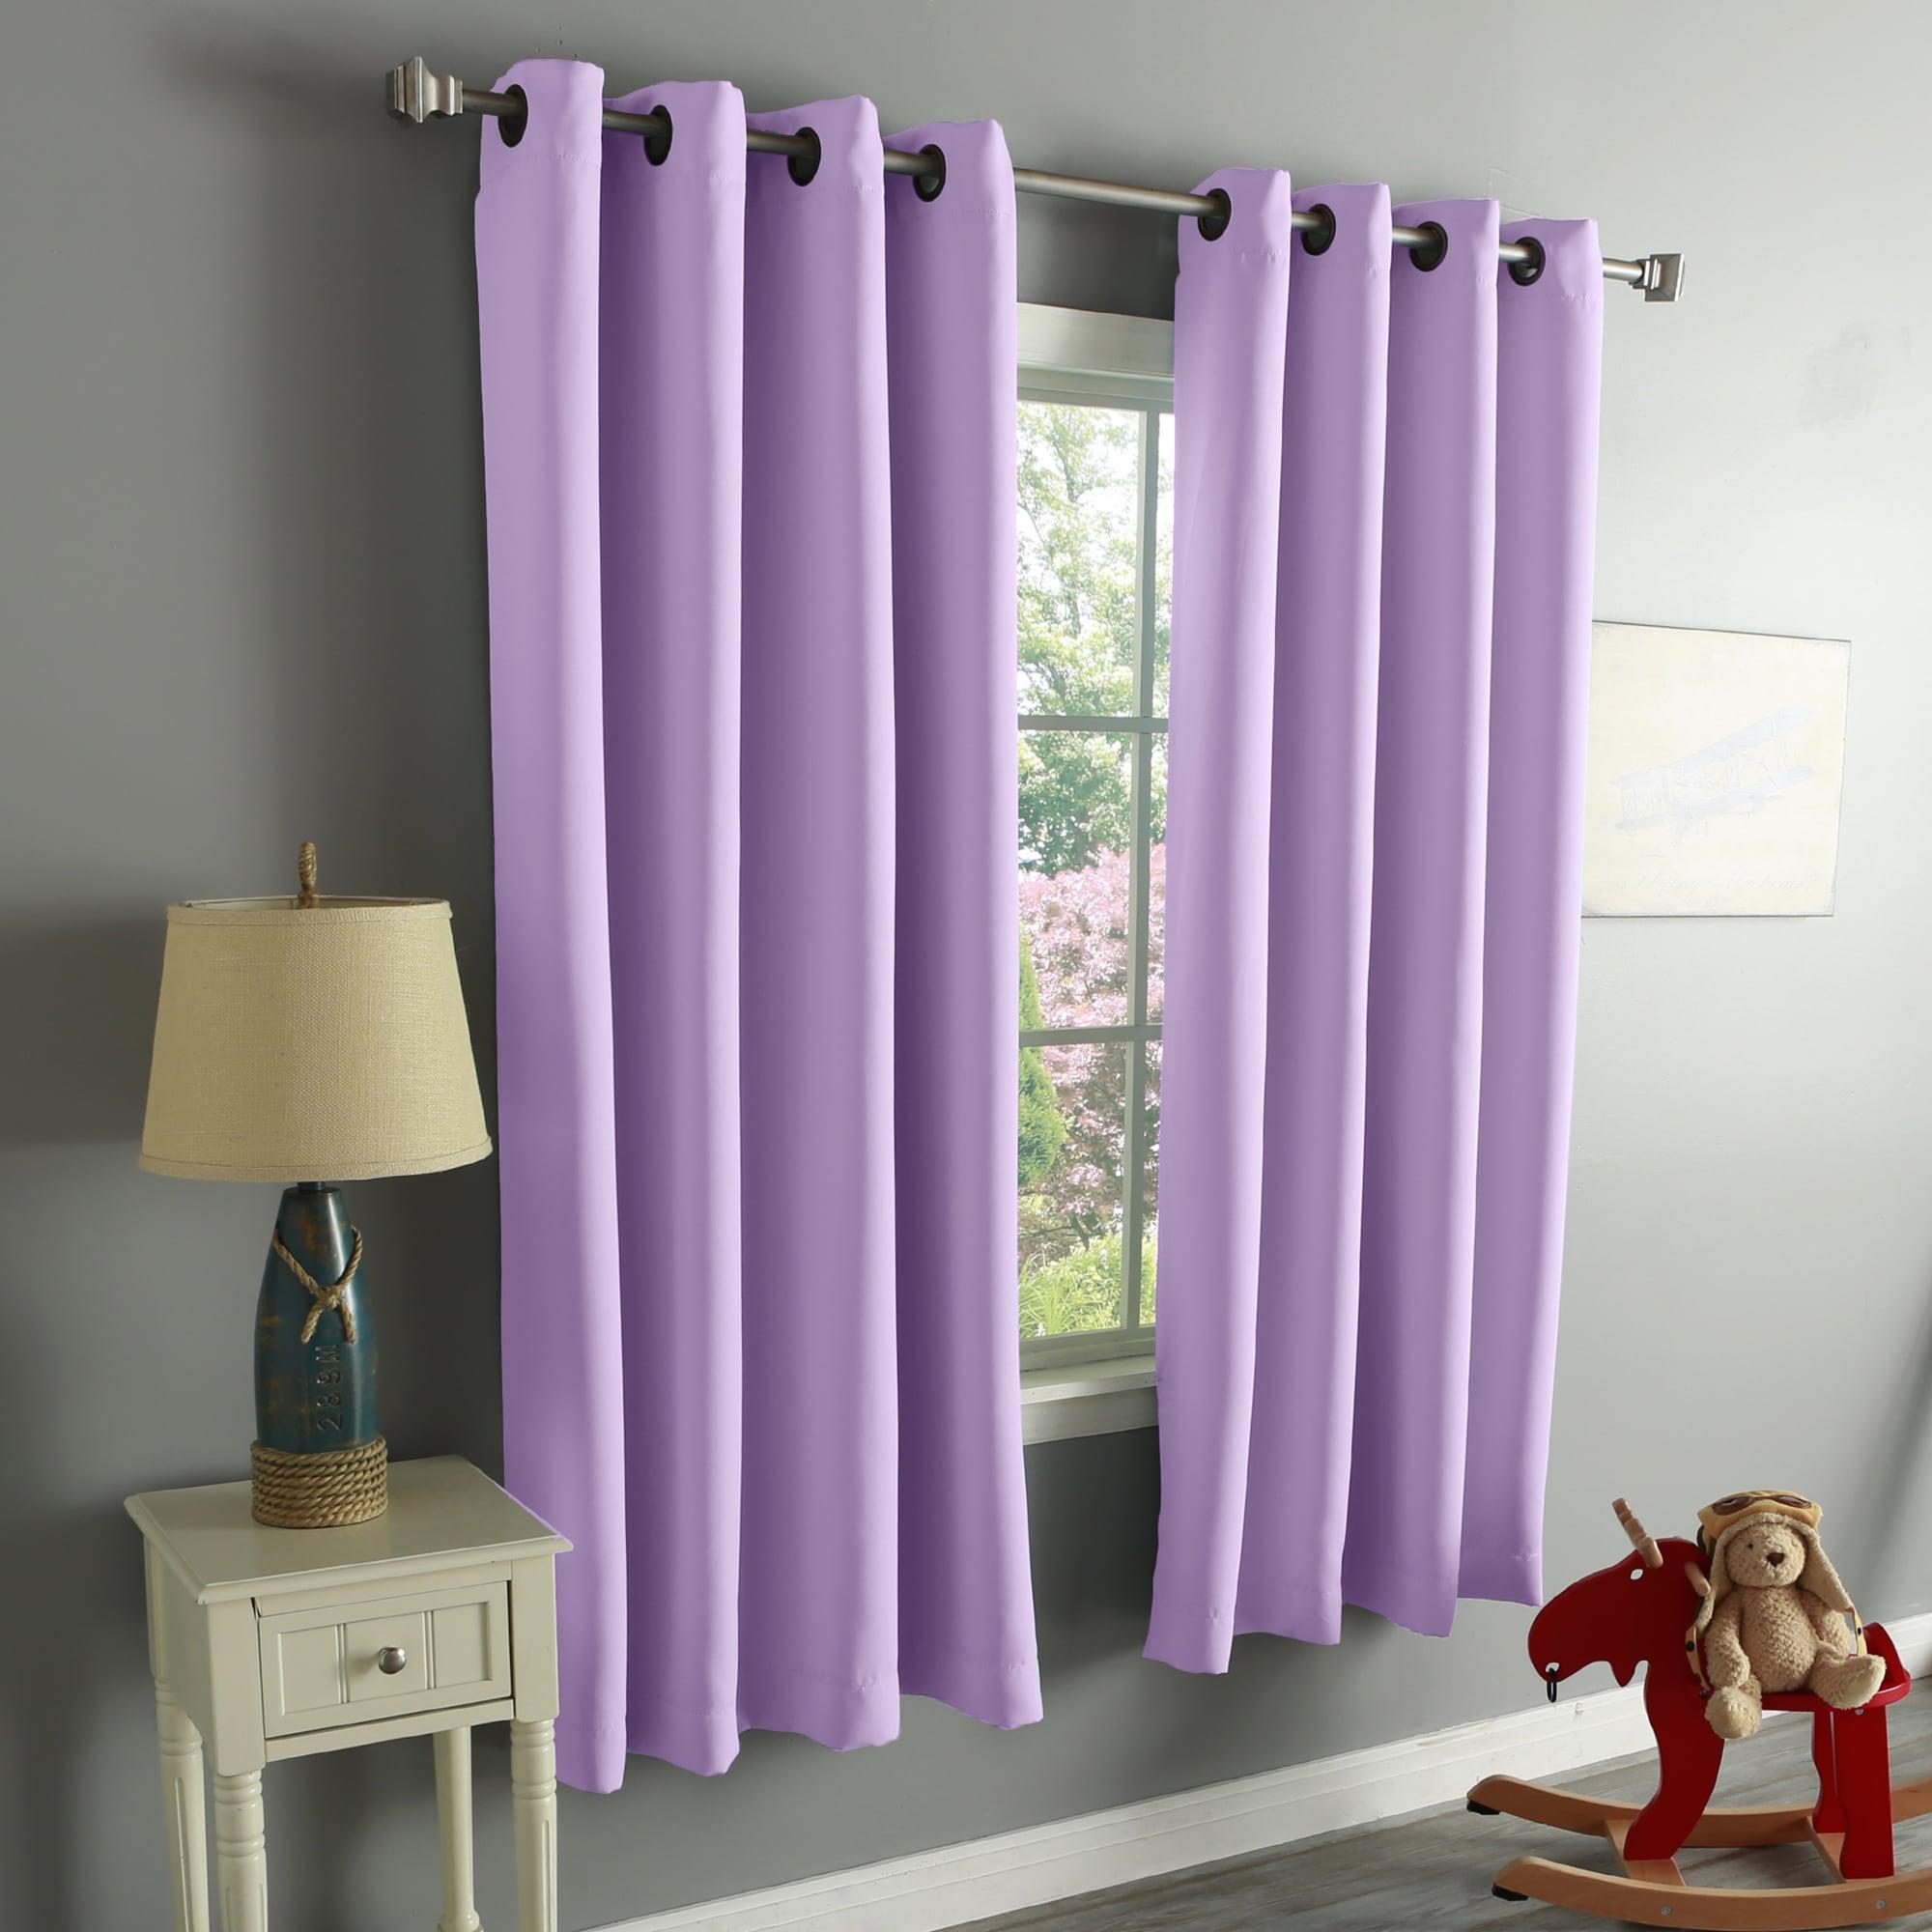 plum pin clarimont curtains or uk purple designer curtain drapes lined